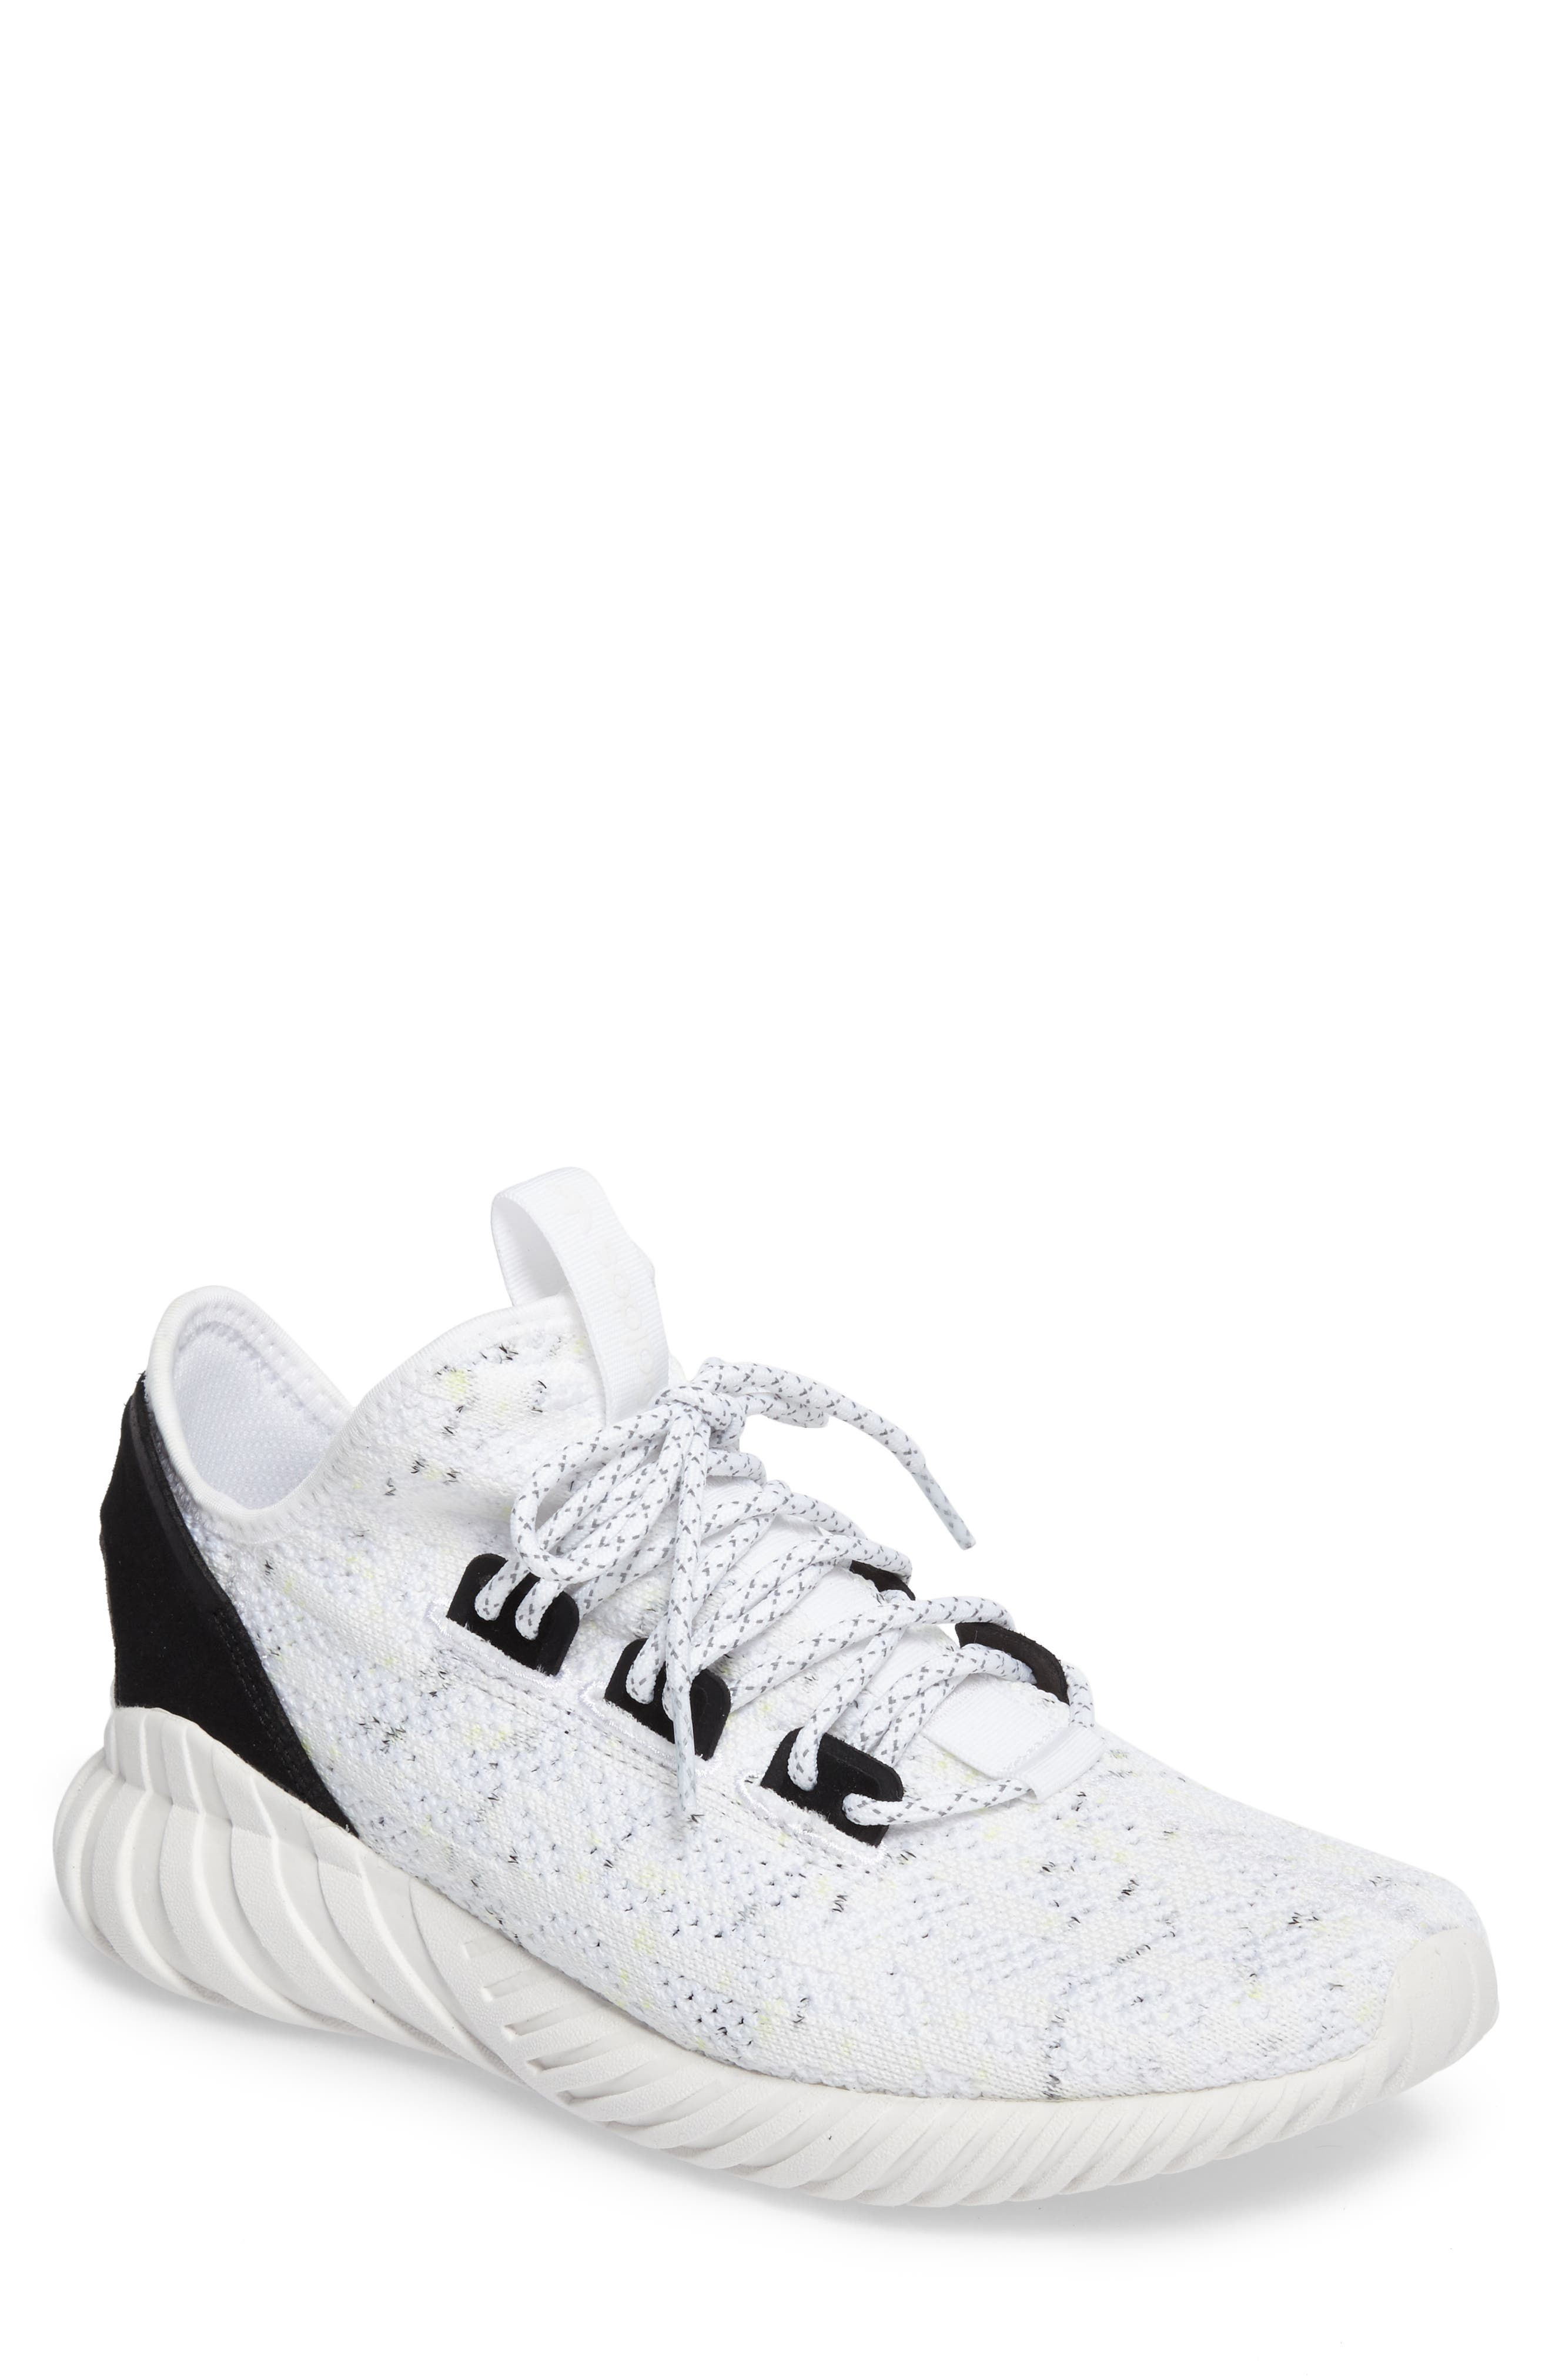 Main Image - adidas Tubular Doom PrimeKnit Sneaker (Men)